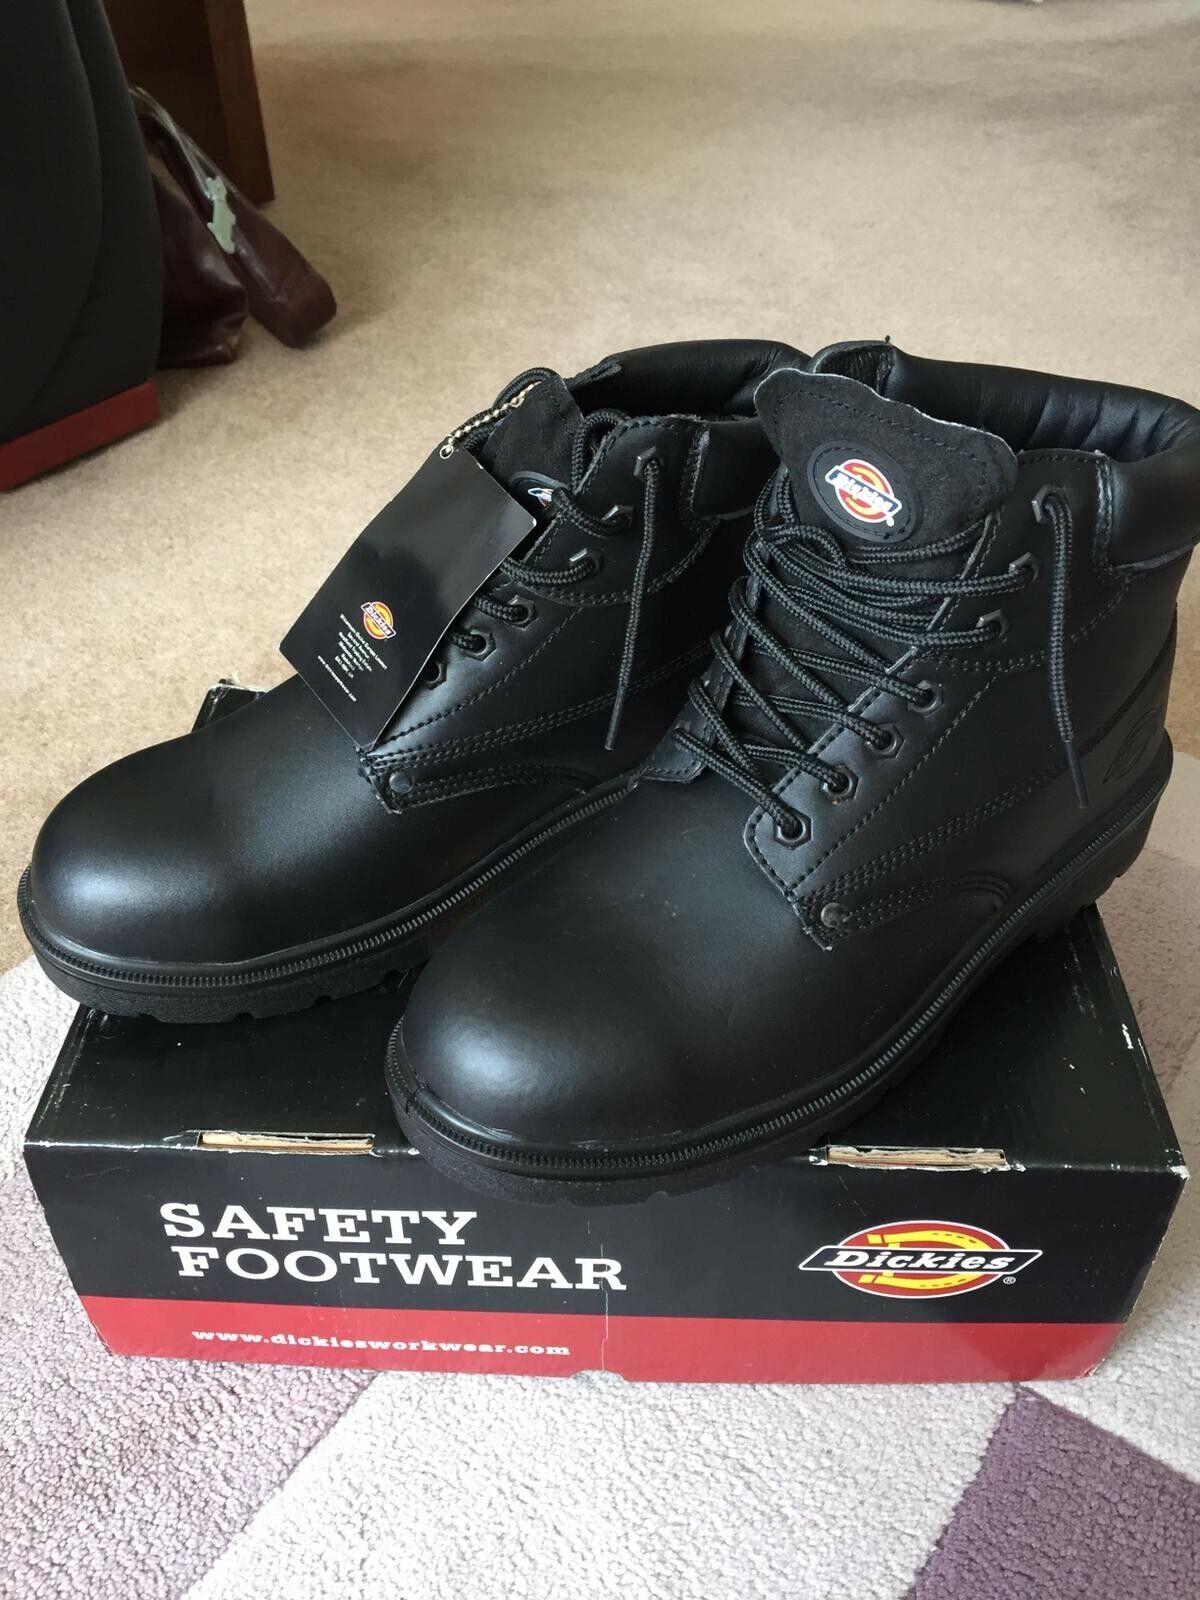 Dickes work boots Antrim Steel Toe Cap BNIB SIZE 10